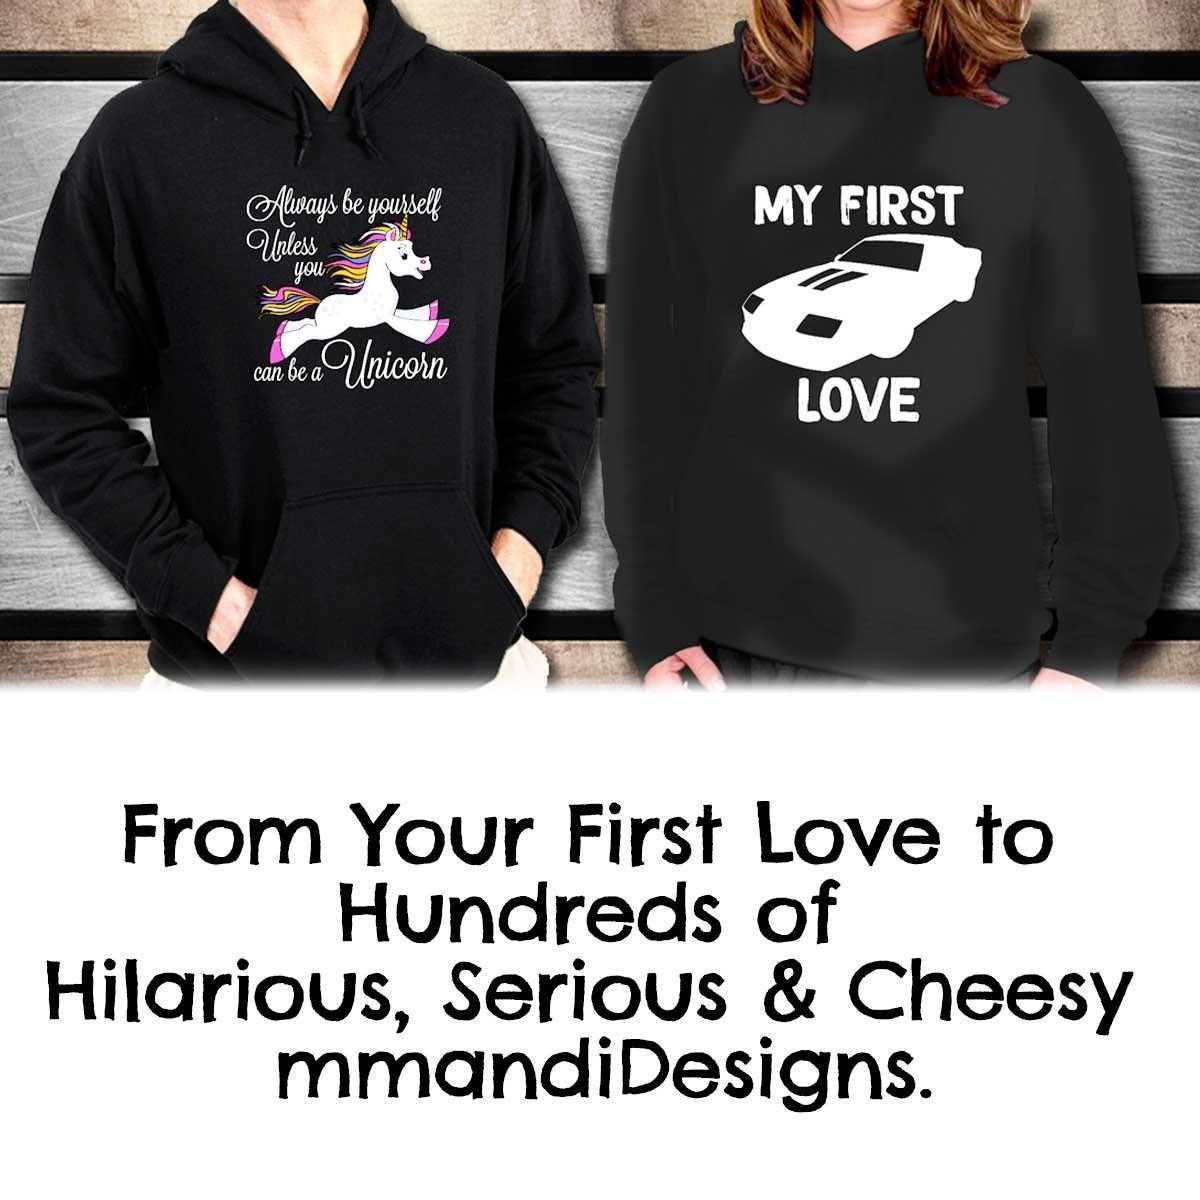 Black mmandiDESIGNS Thunderbird My First Love Personal Luxury Car Hoodie